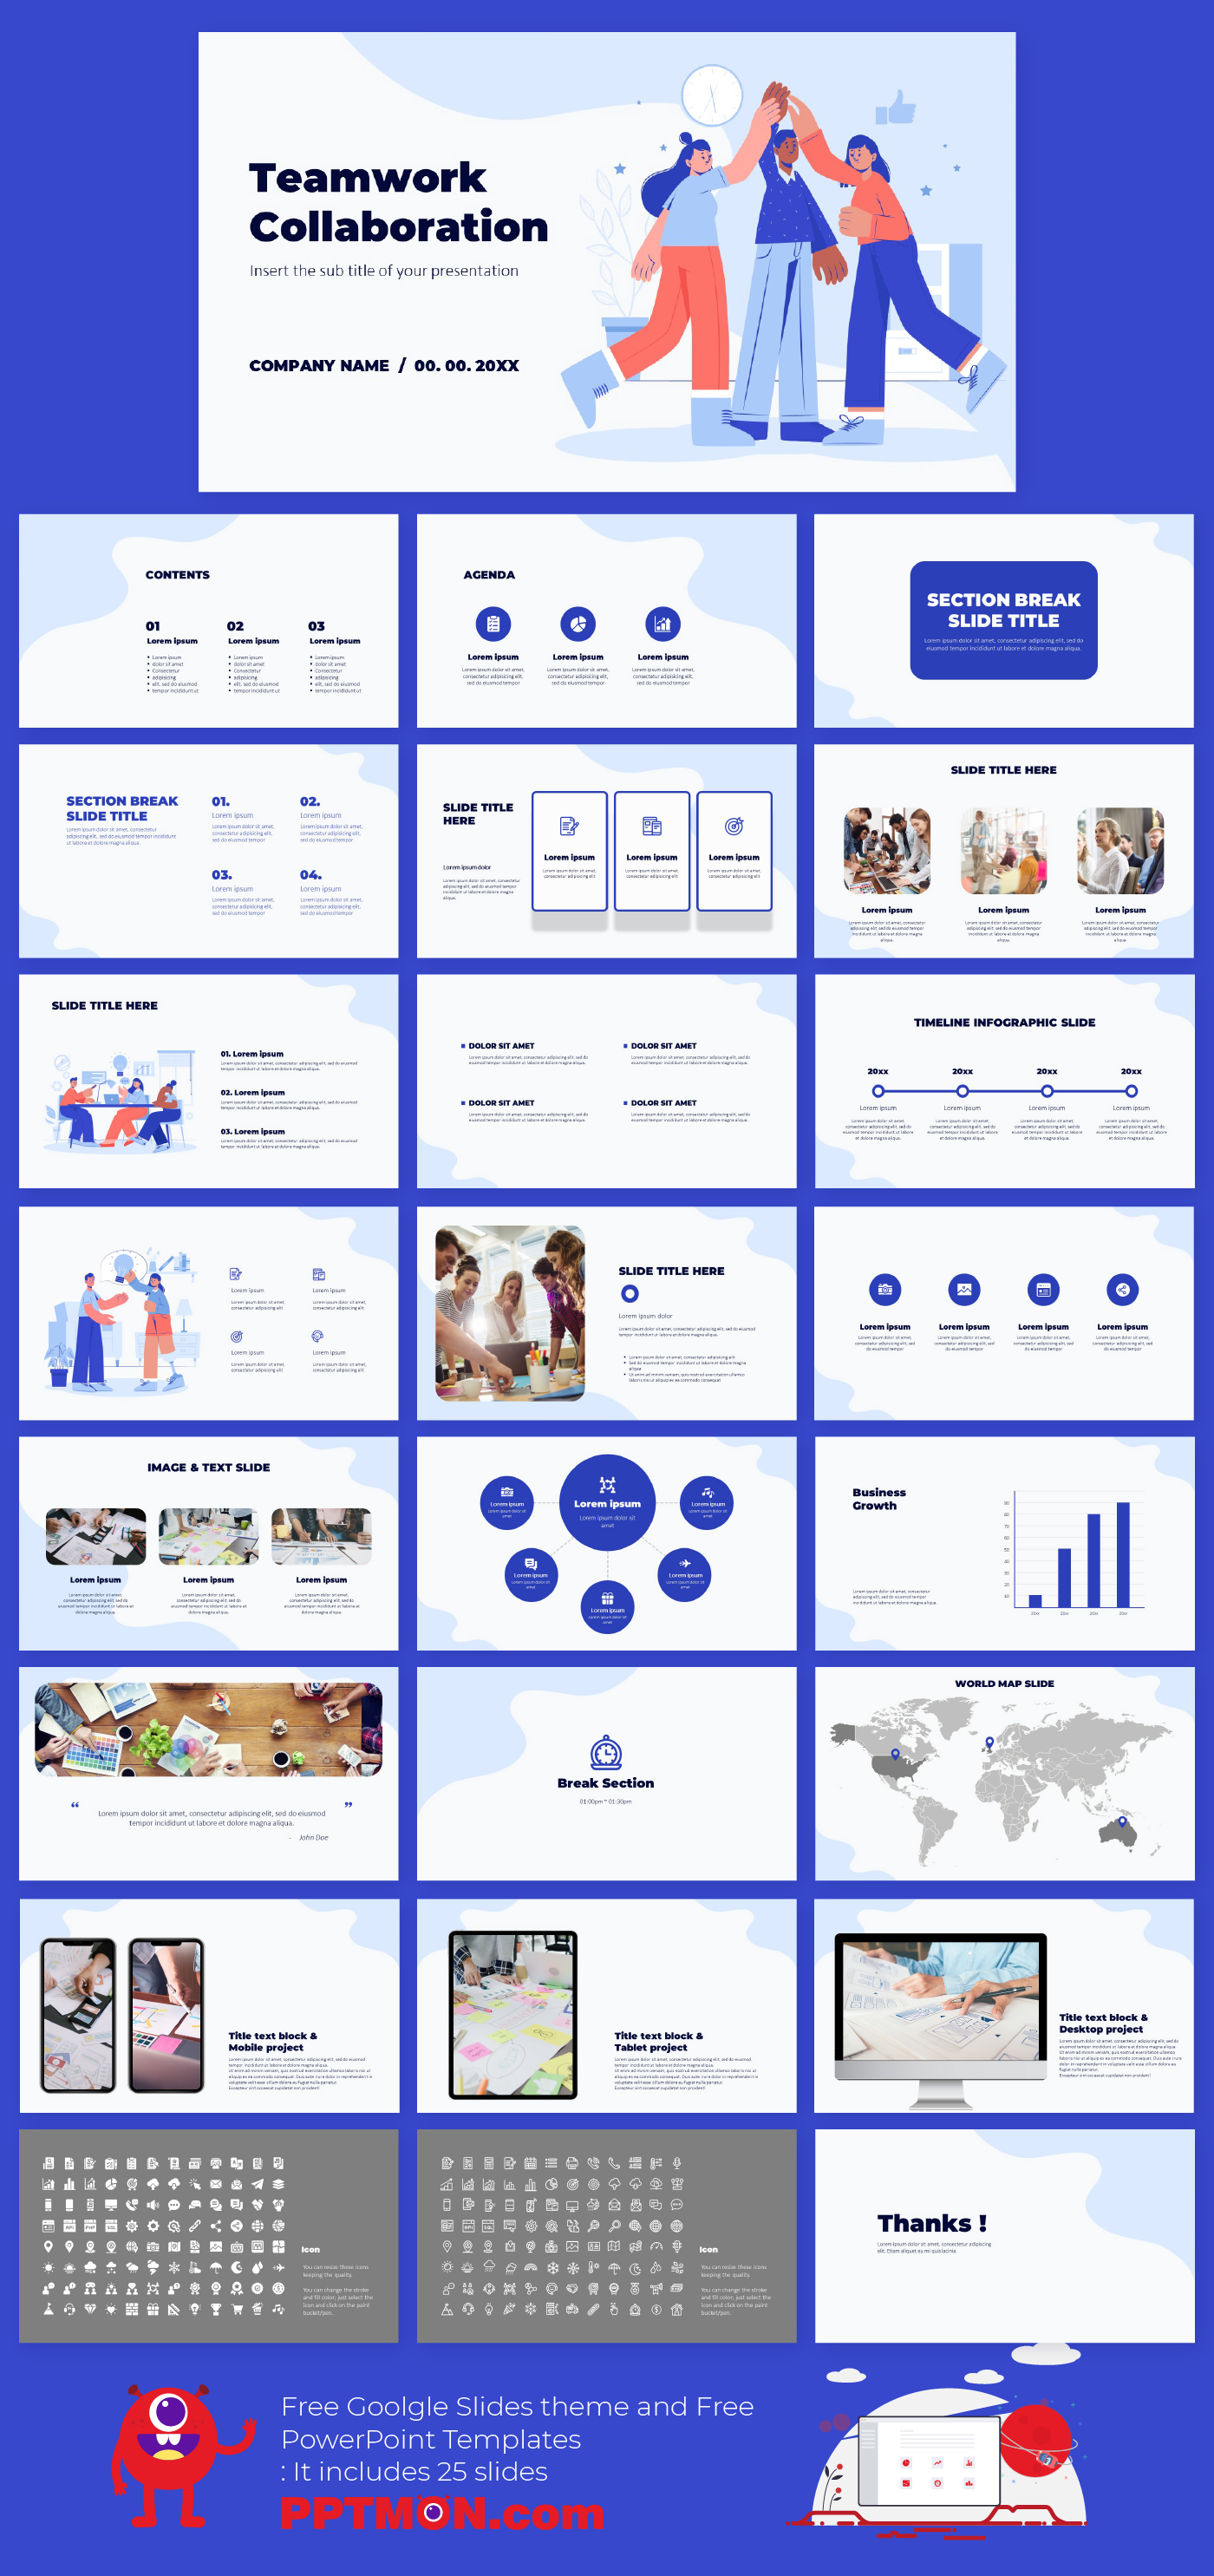 Teamwork Collaboration Presentation Design Free Powerpoint Template And Google Sl Teamwork And Collaboration Powerpoint Templates Powerpoint Design Templates